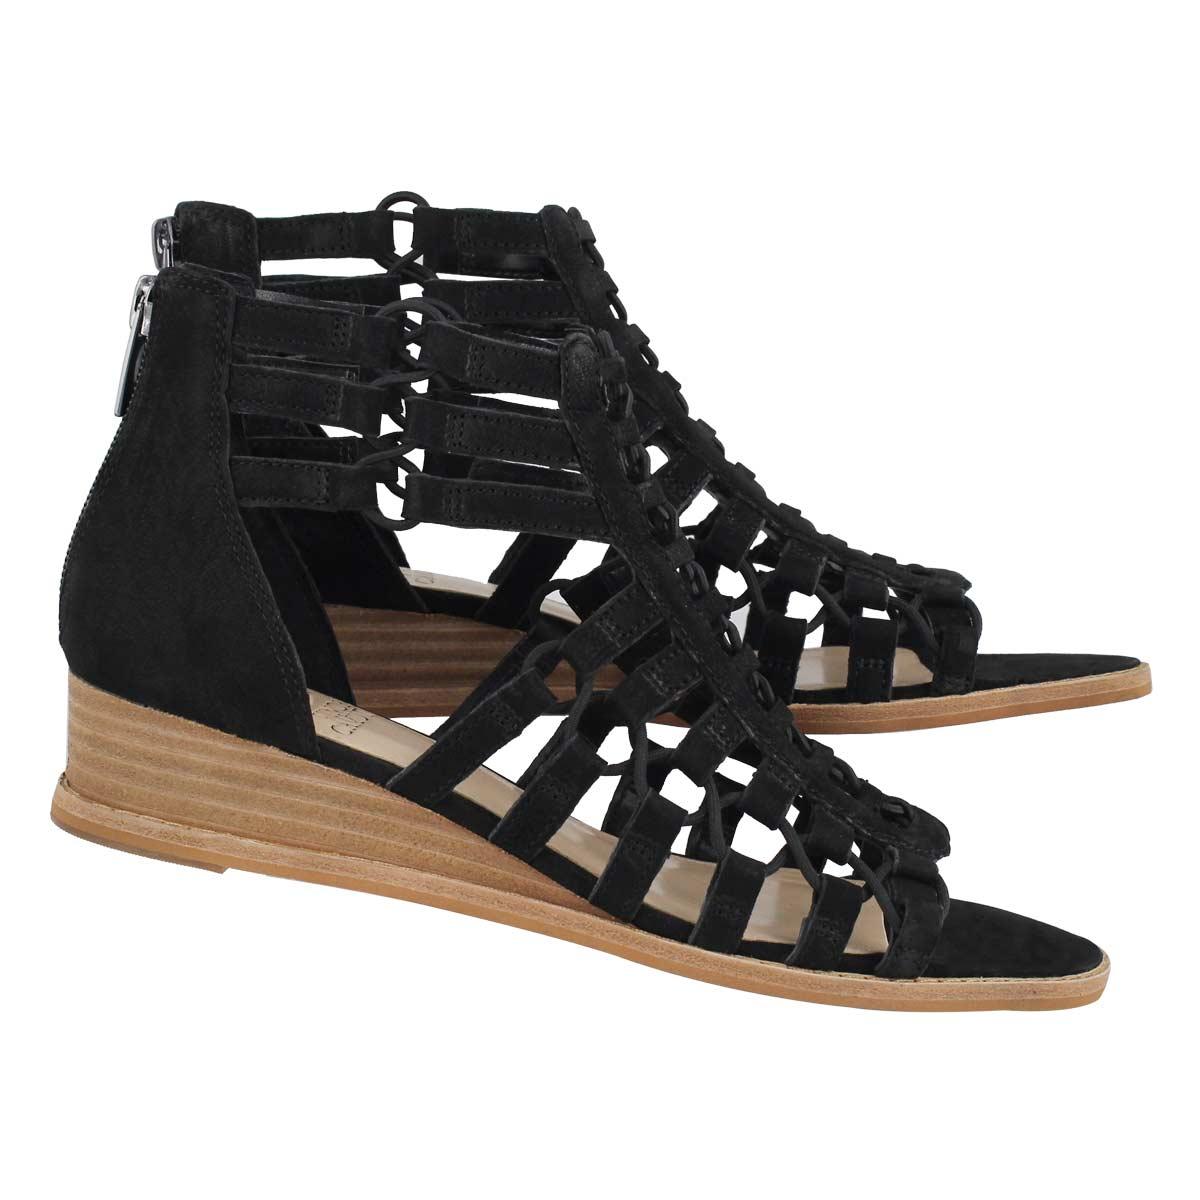 Lds Richetta black casual wedge sandal